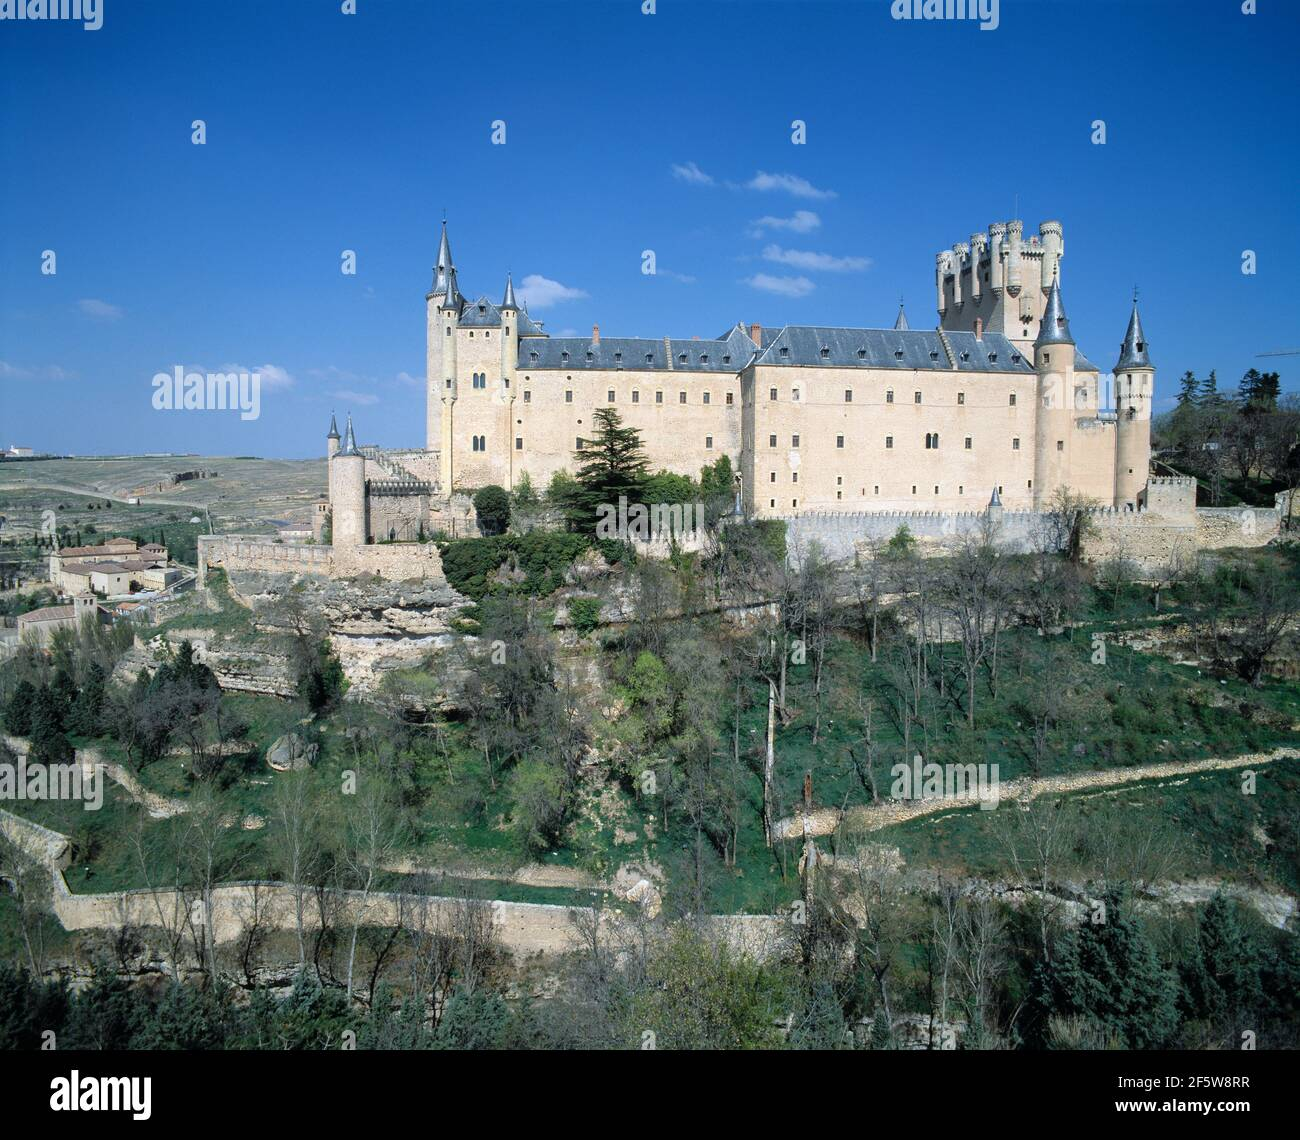 Spain. Segovia. Alcazar. Fortified Palace. Stock Photo